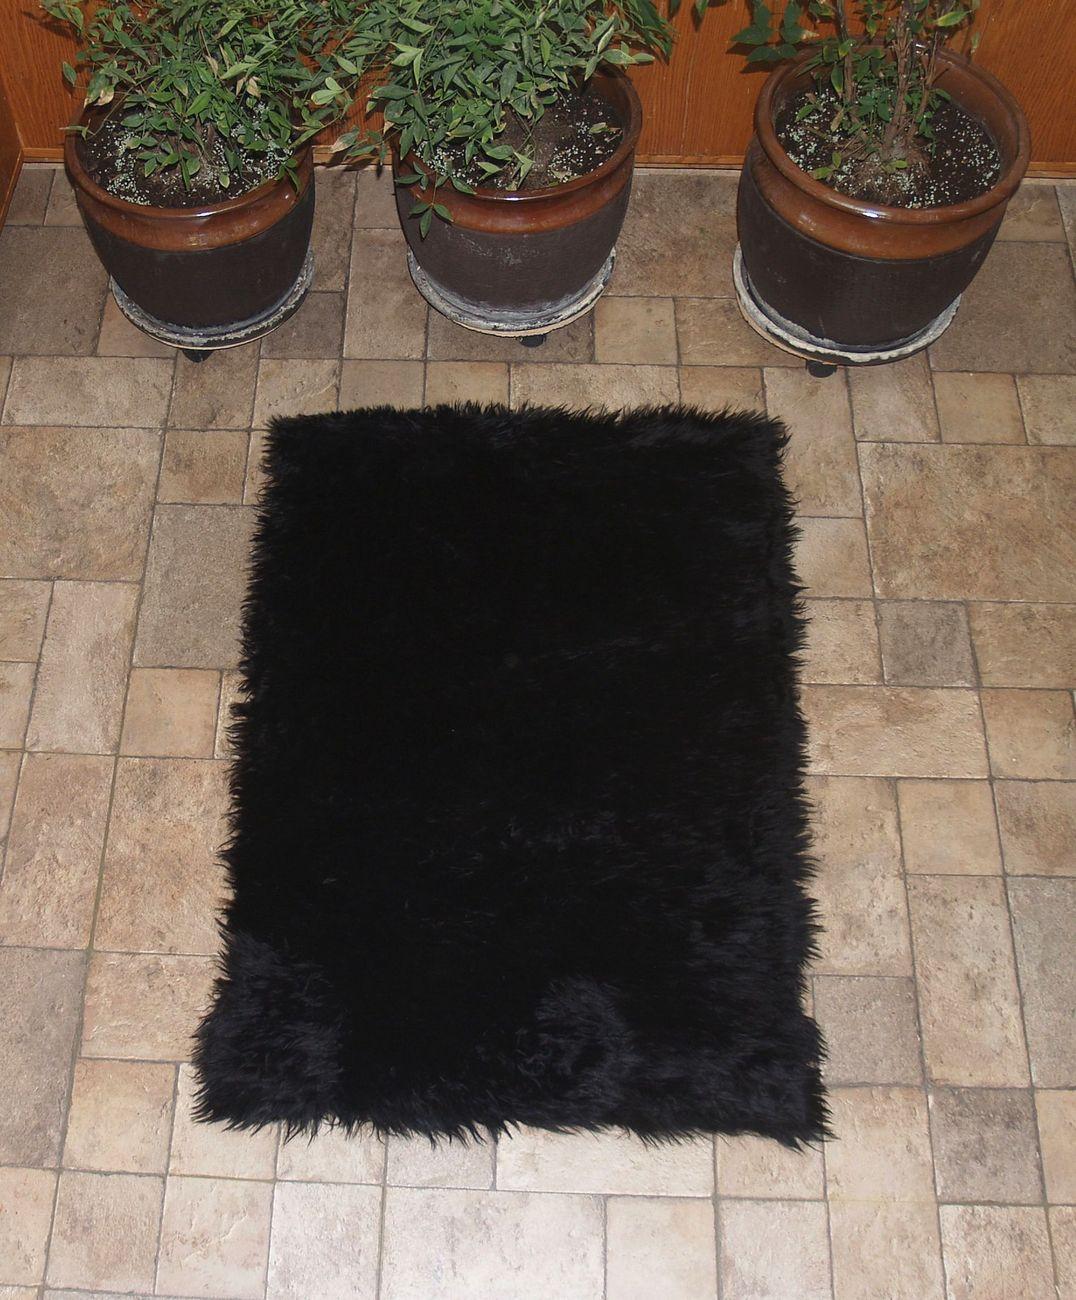 Black faux fur rug rectangle view2